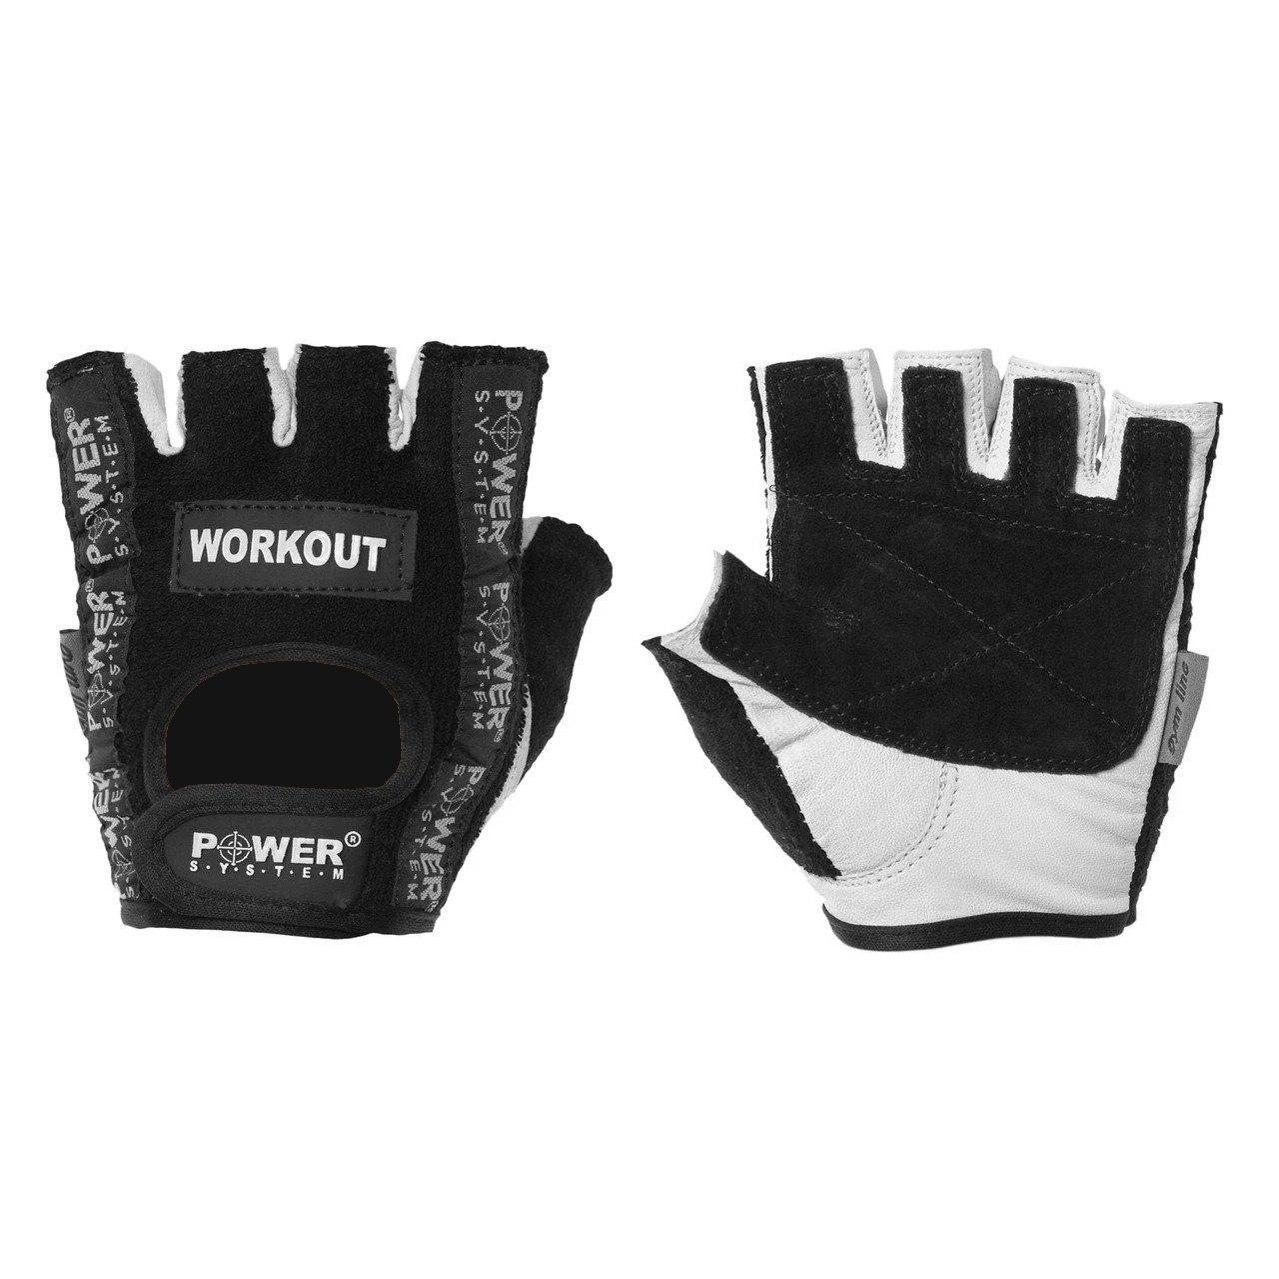 Рукавички для фітнесу і важкої атлетики Power System Workout PS-2200 M Black